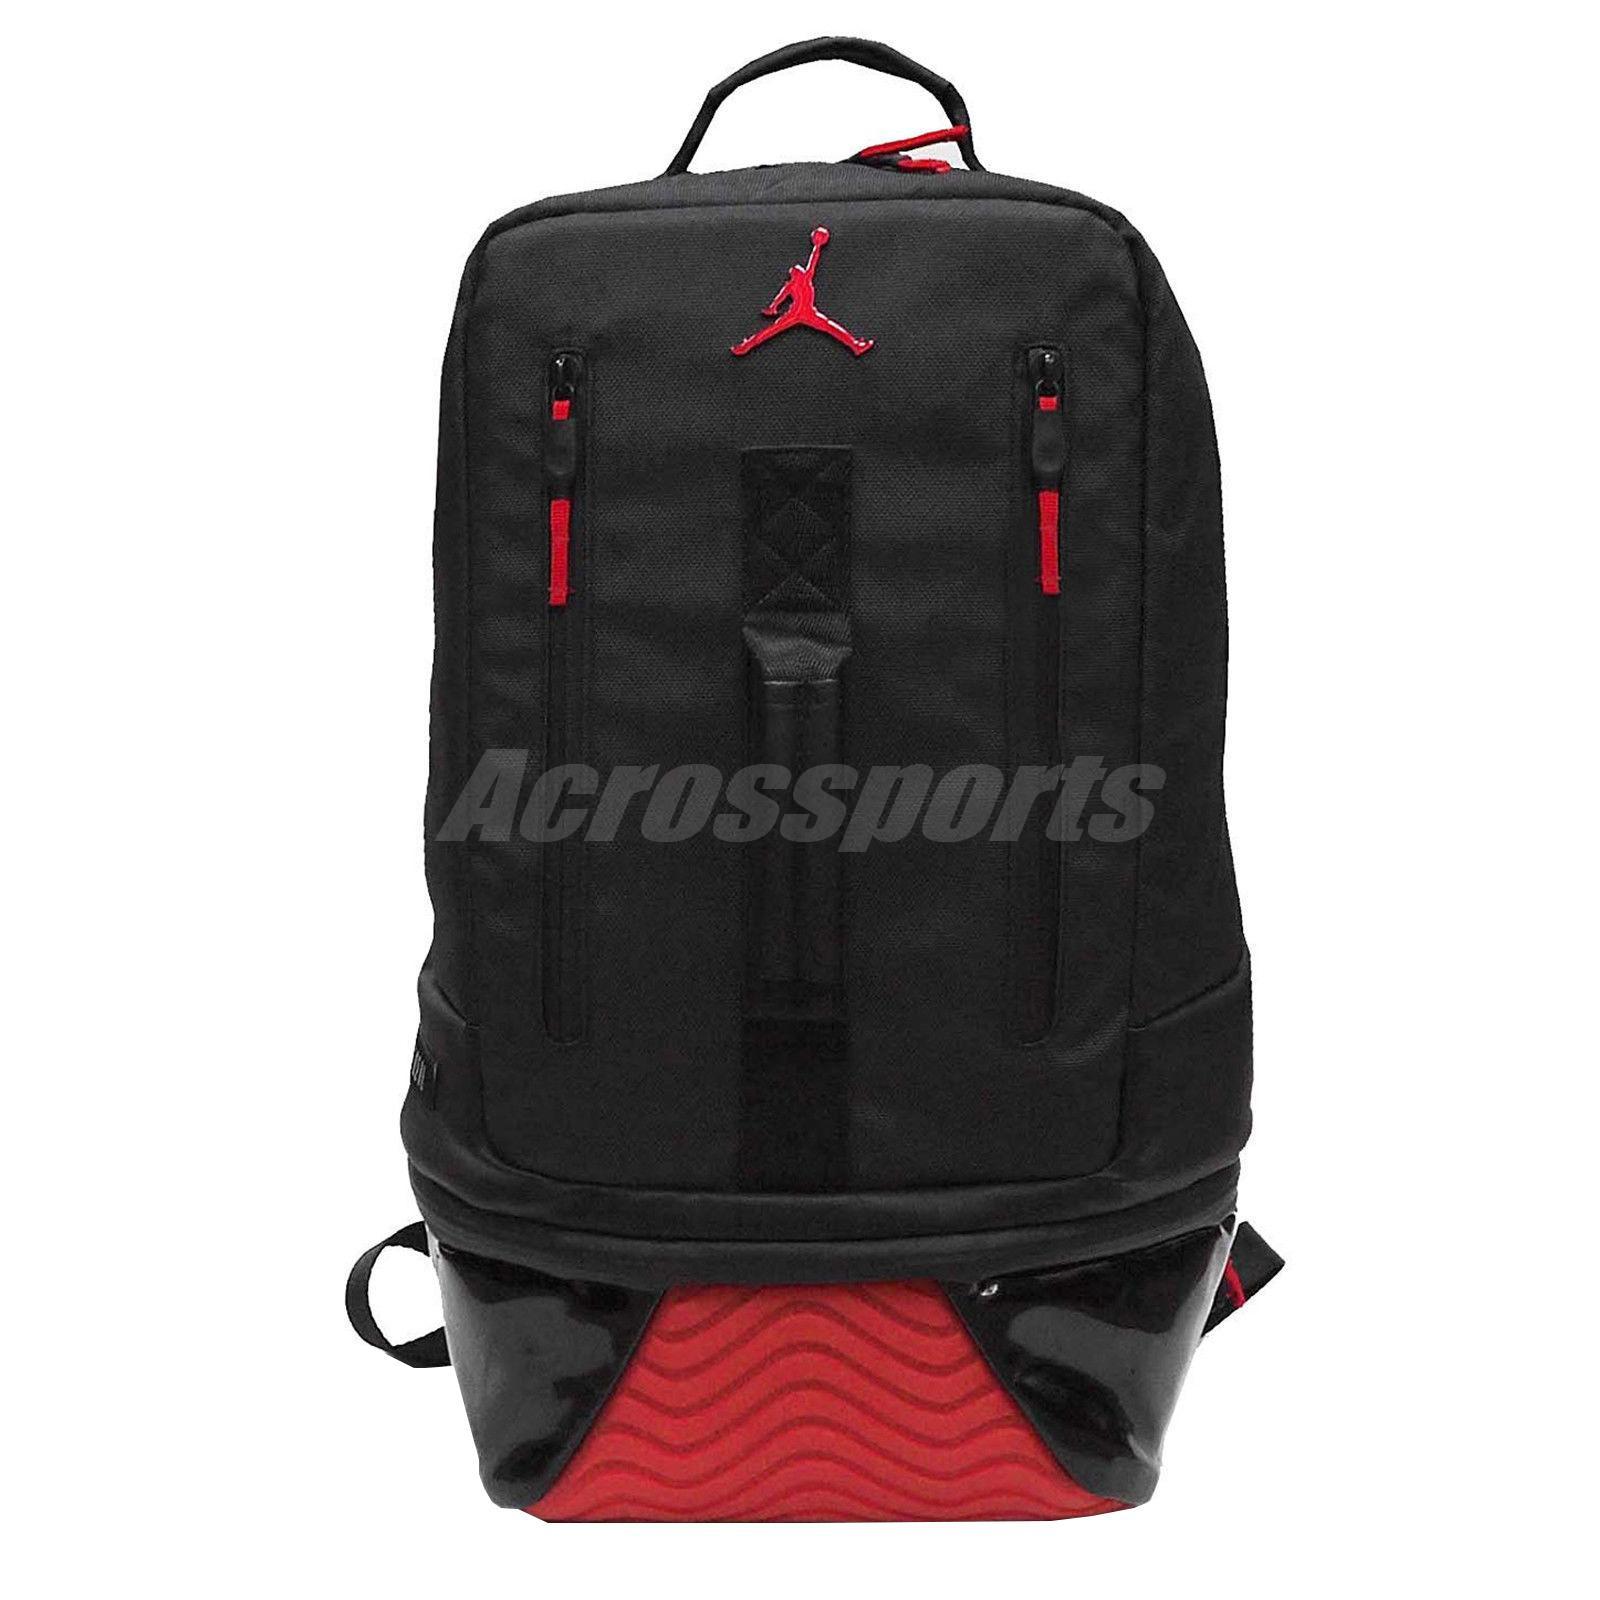 07e96b3e1ff8 Details about Nike Air Jordan Retro 11 XI Pack Bred Black Red Basketball Gym  Backpack Bookbag